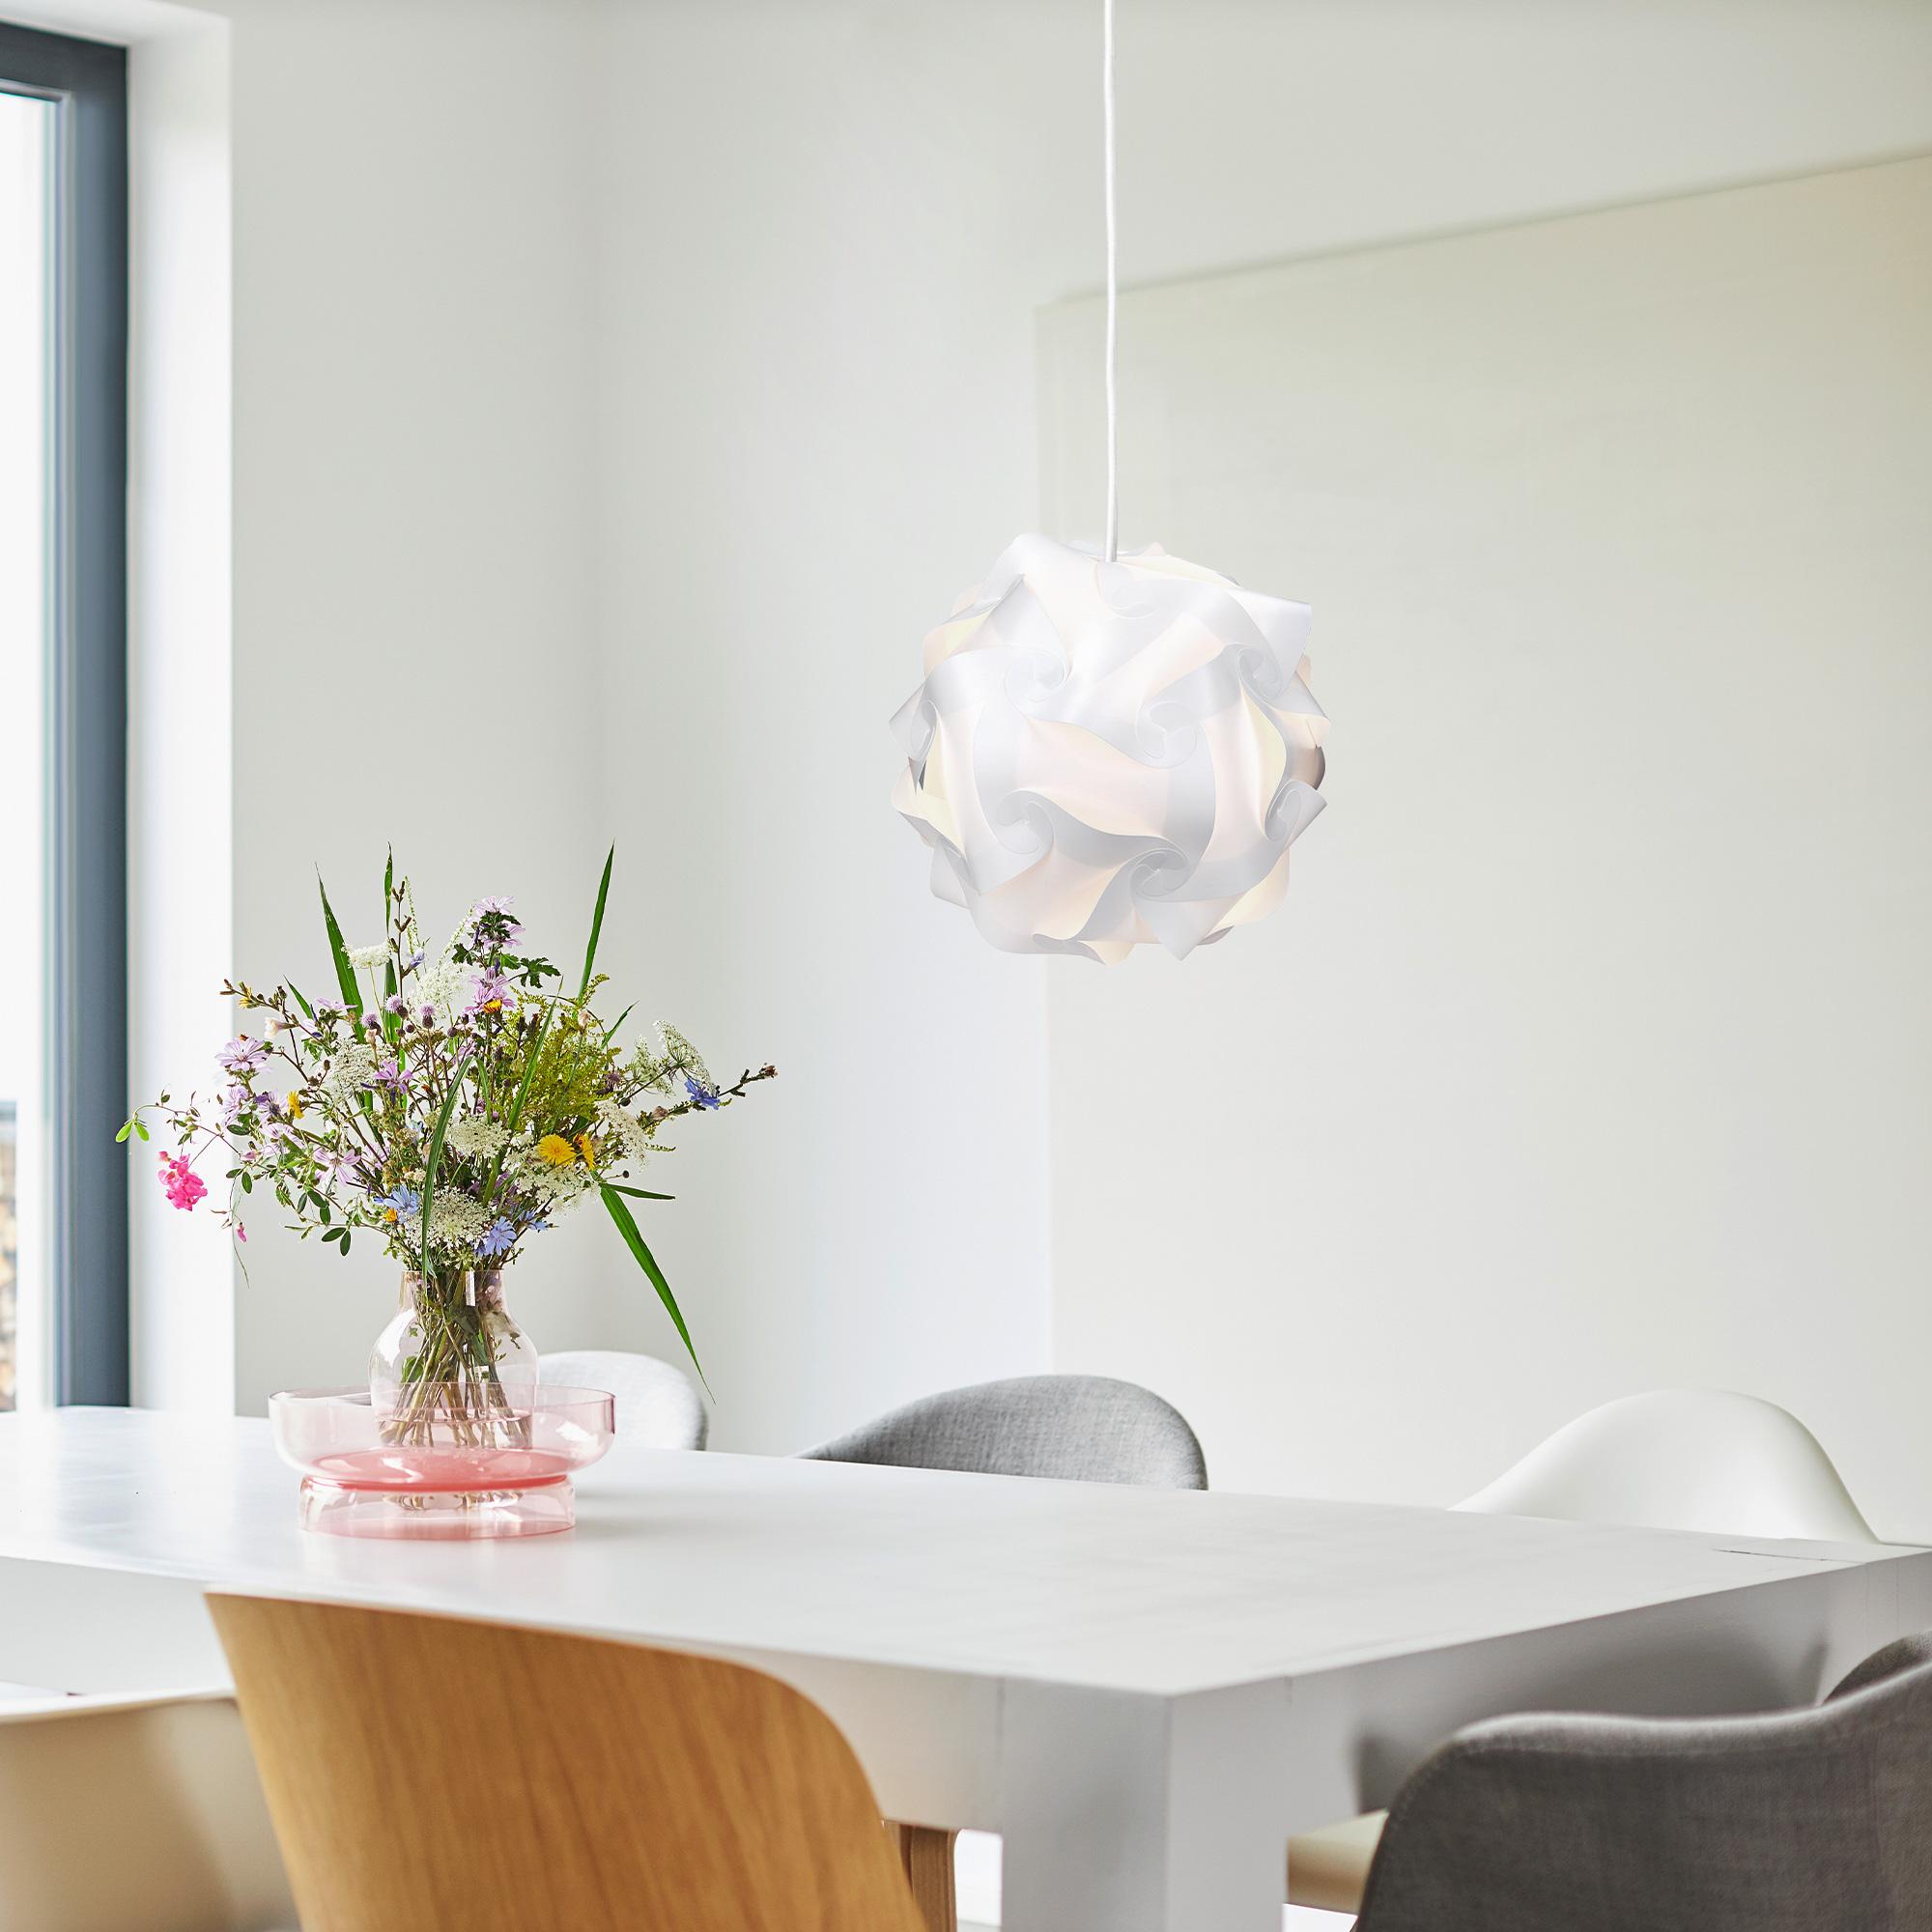 diy puzzle lampe lampenschirm schirm min 15 designs ca 20 cm gr s in wei ebay. Black Bedroom Furniture Sets. Home Design Ideas